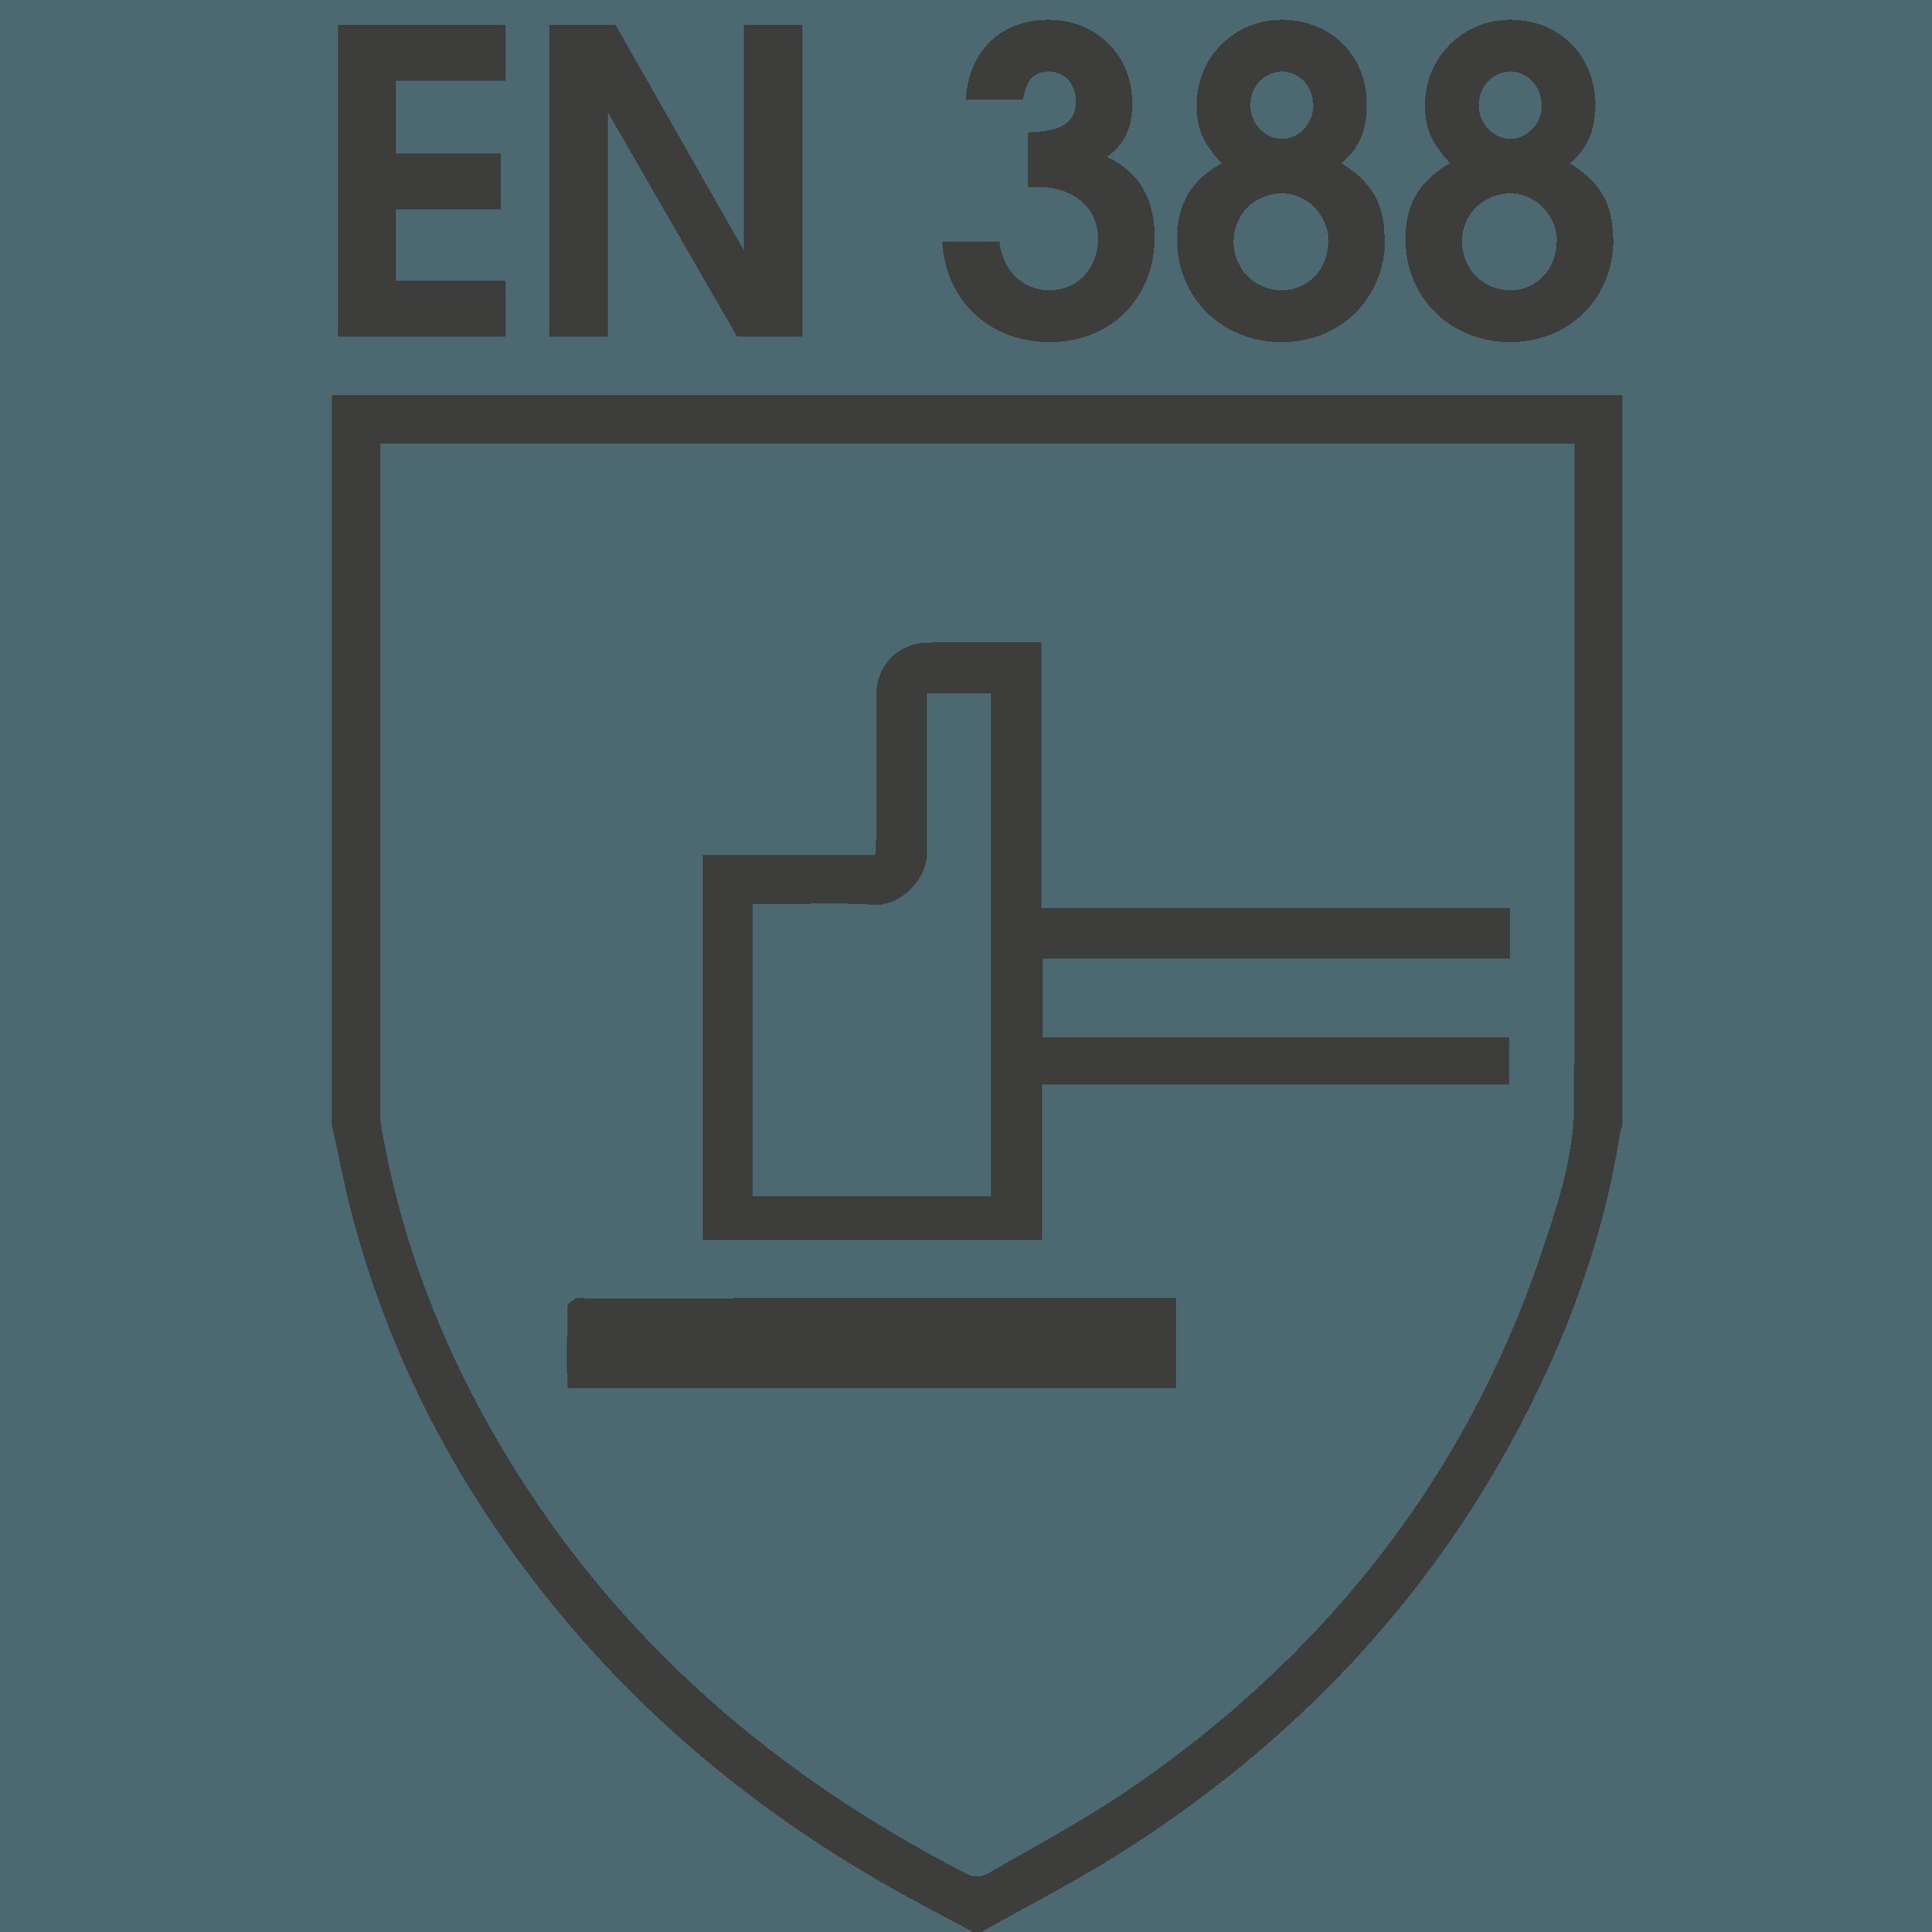 EN388 มาตรฐานความปลอดภัยระดับโลก